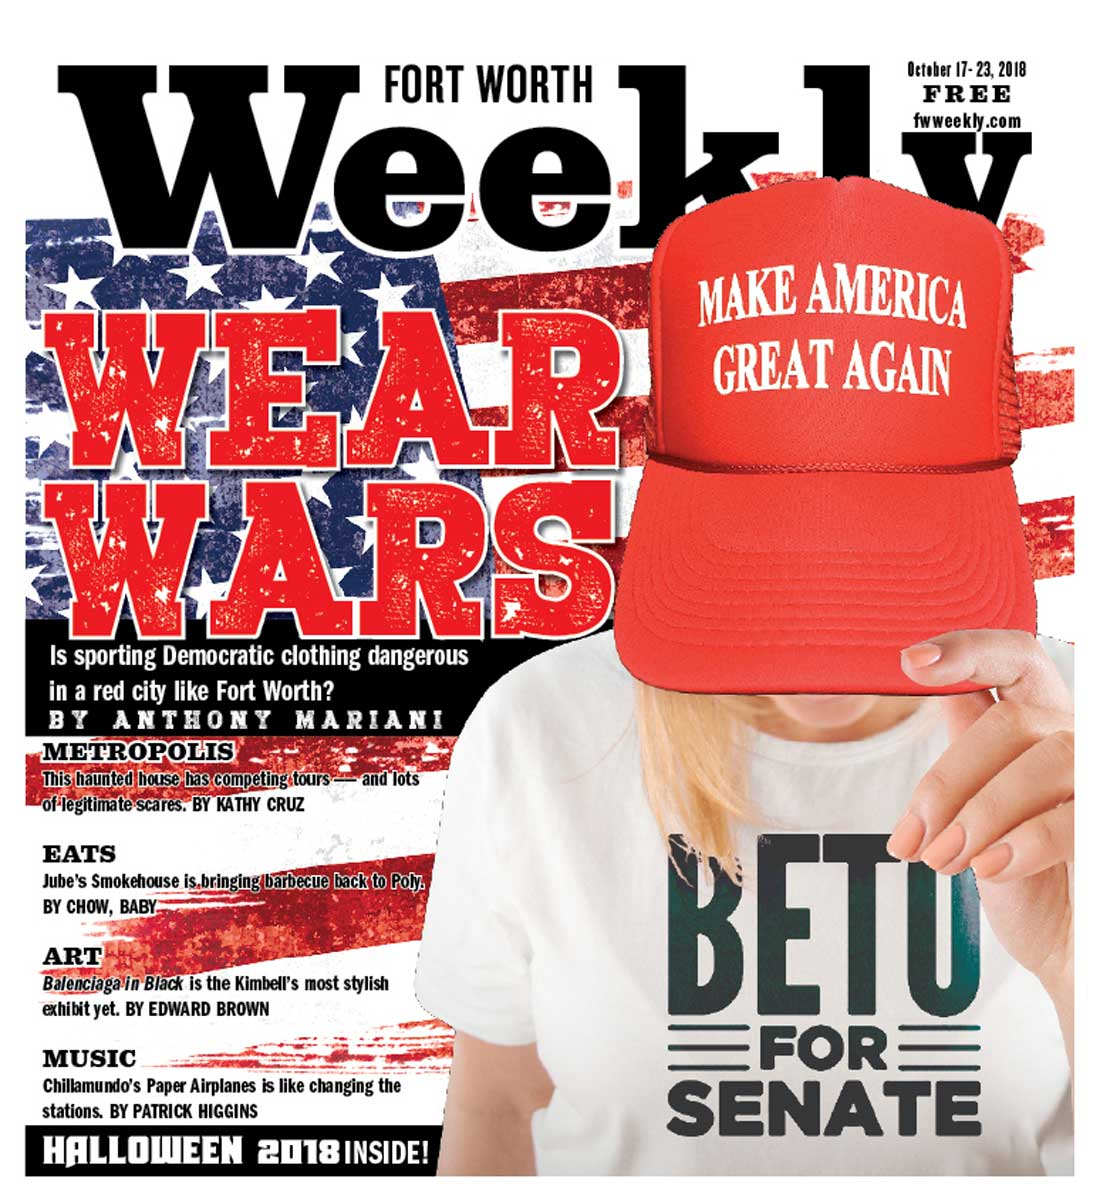 Wear Wars Fort Worth Weekly